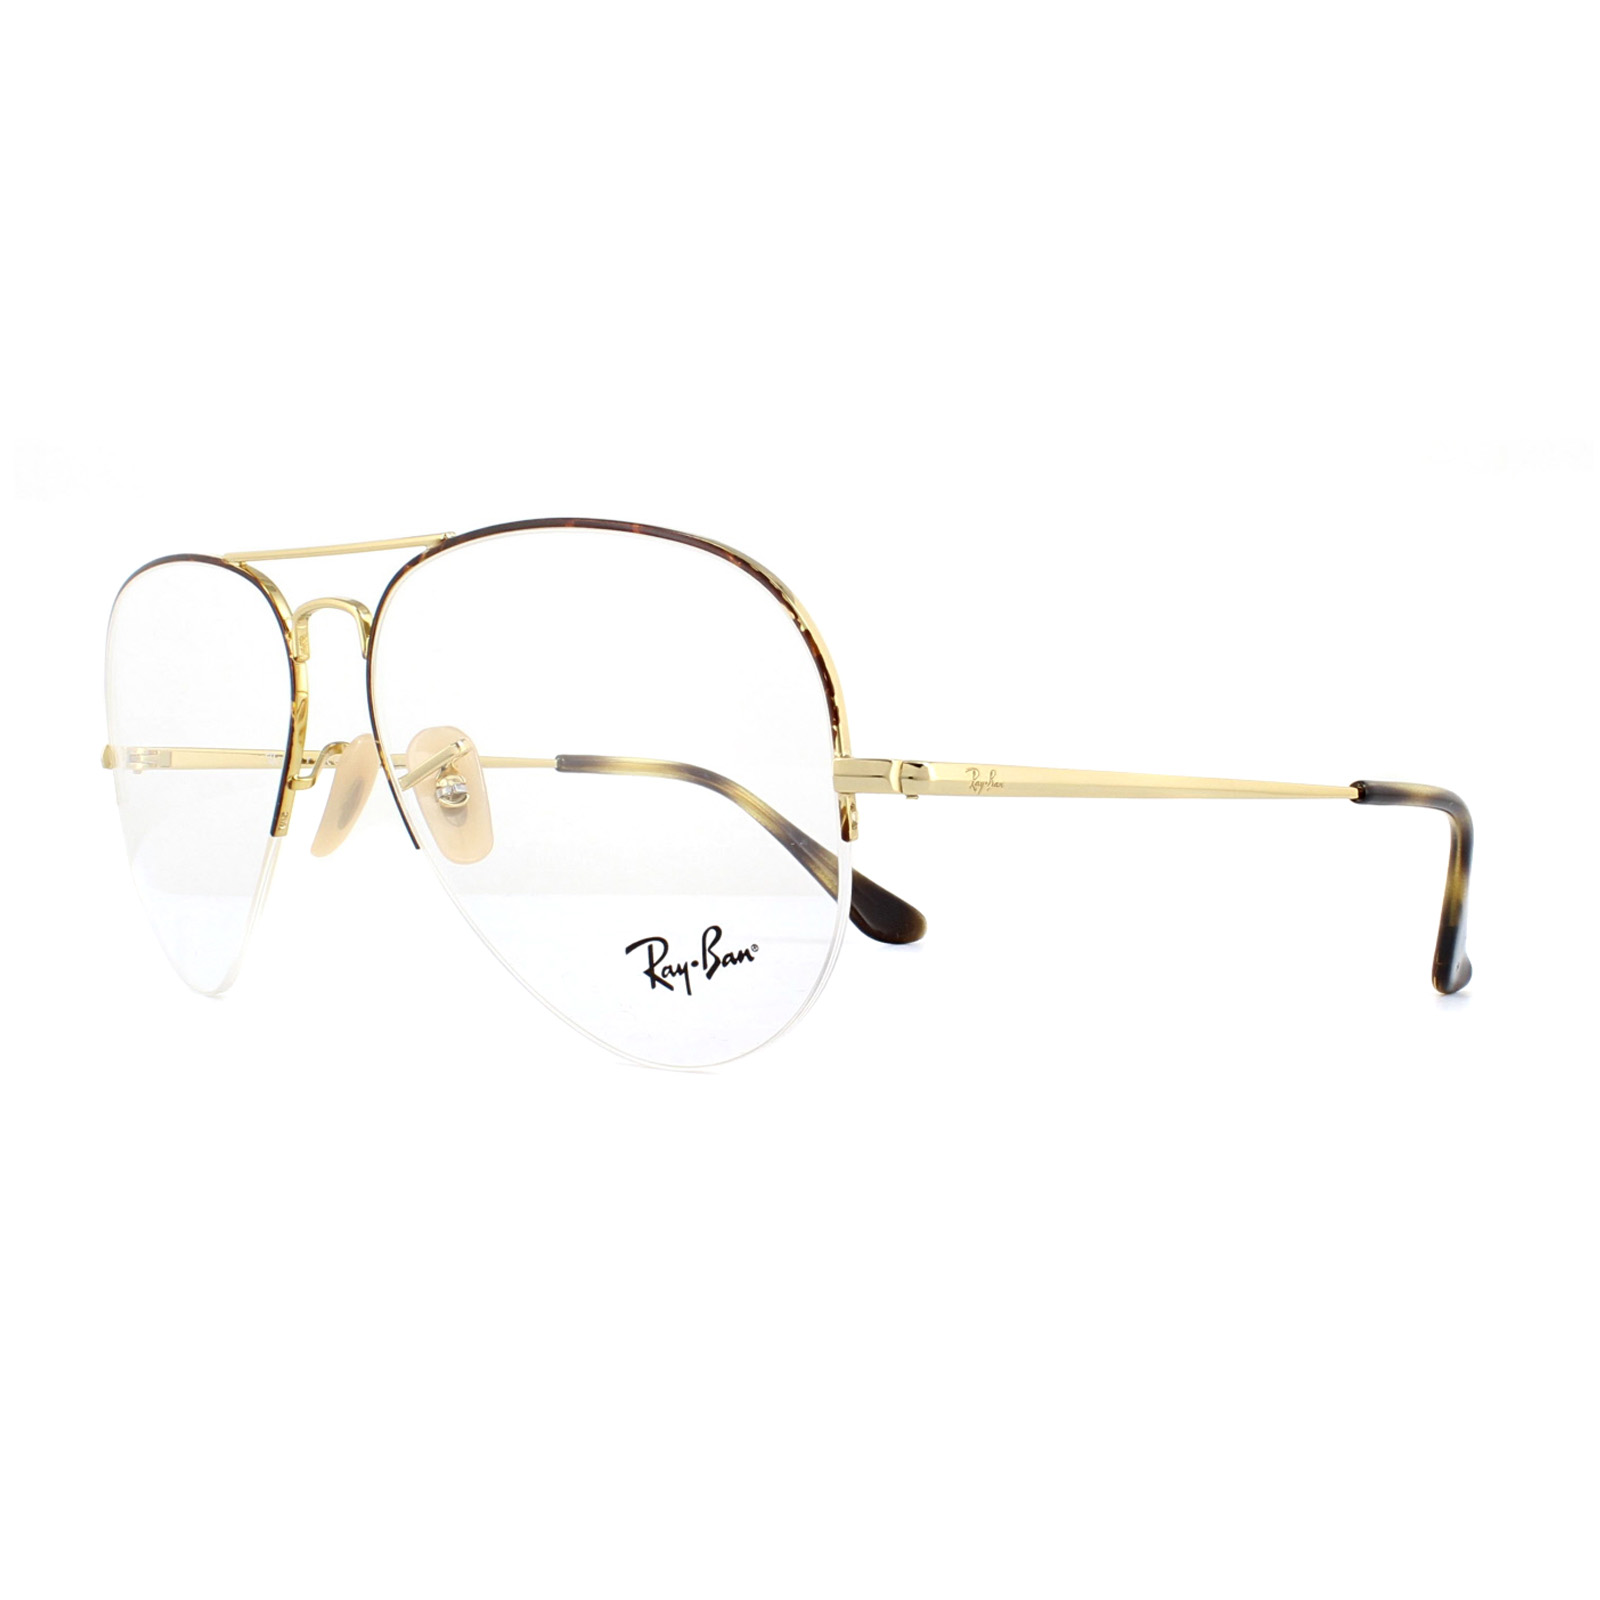 3db8953a7f Ray-Ban Glasses Frames 6589 2945 Gold on Havana 59mm 8053672864113 ...